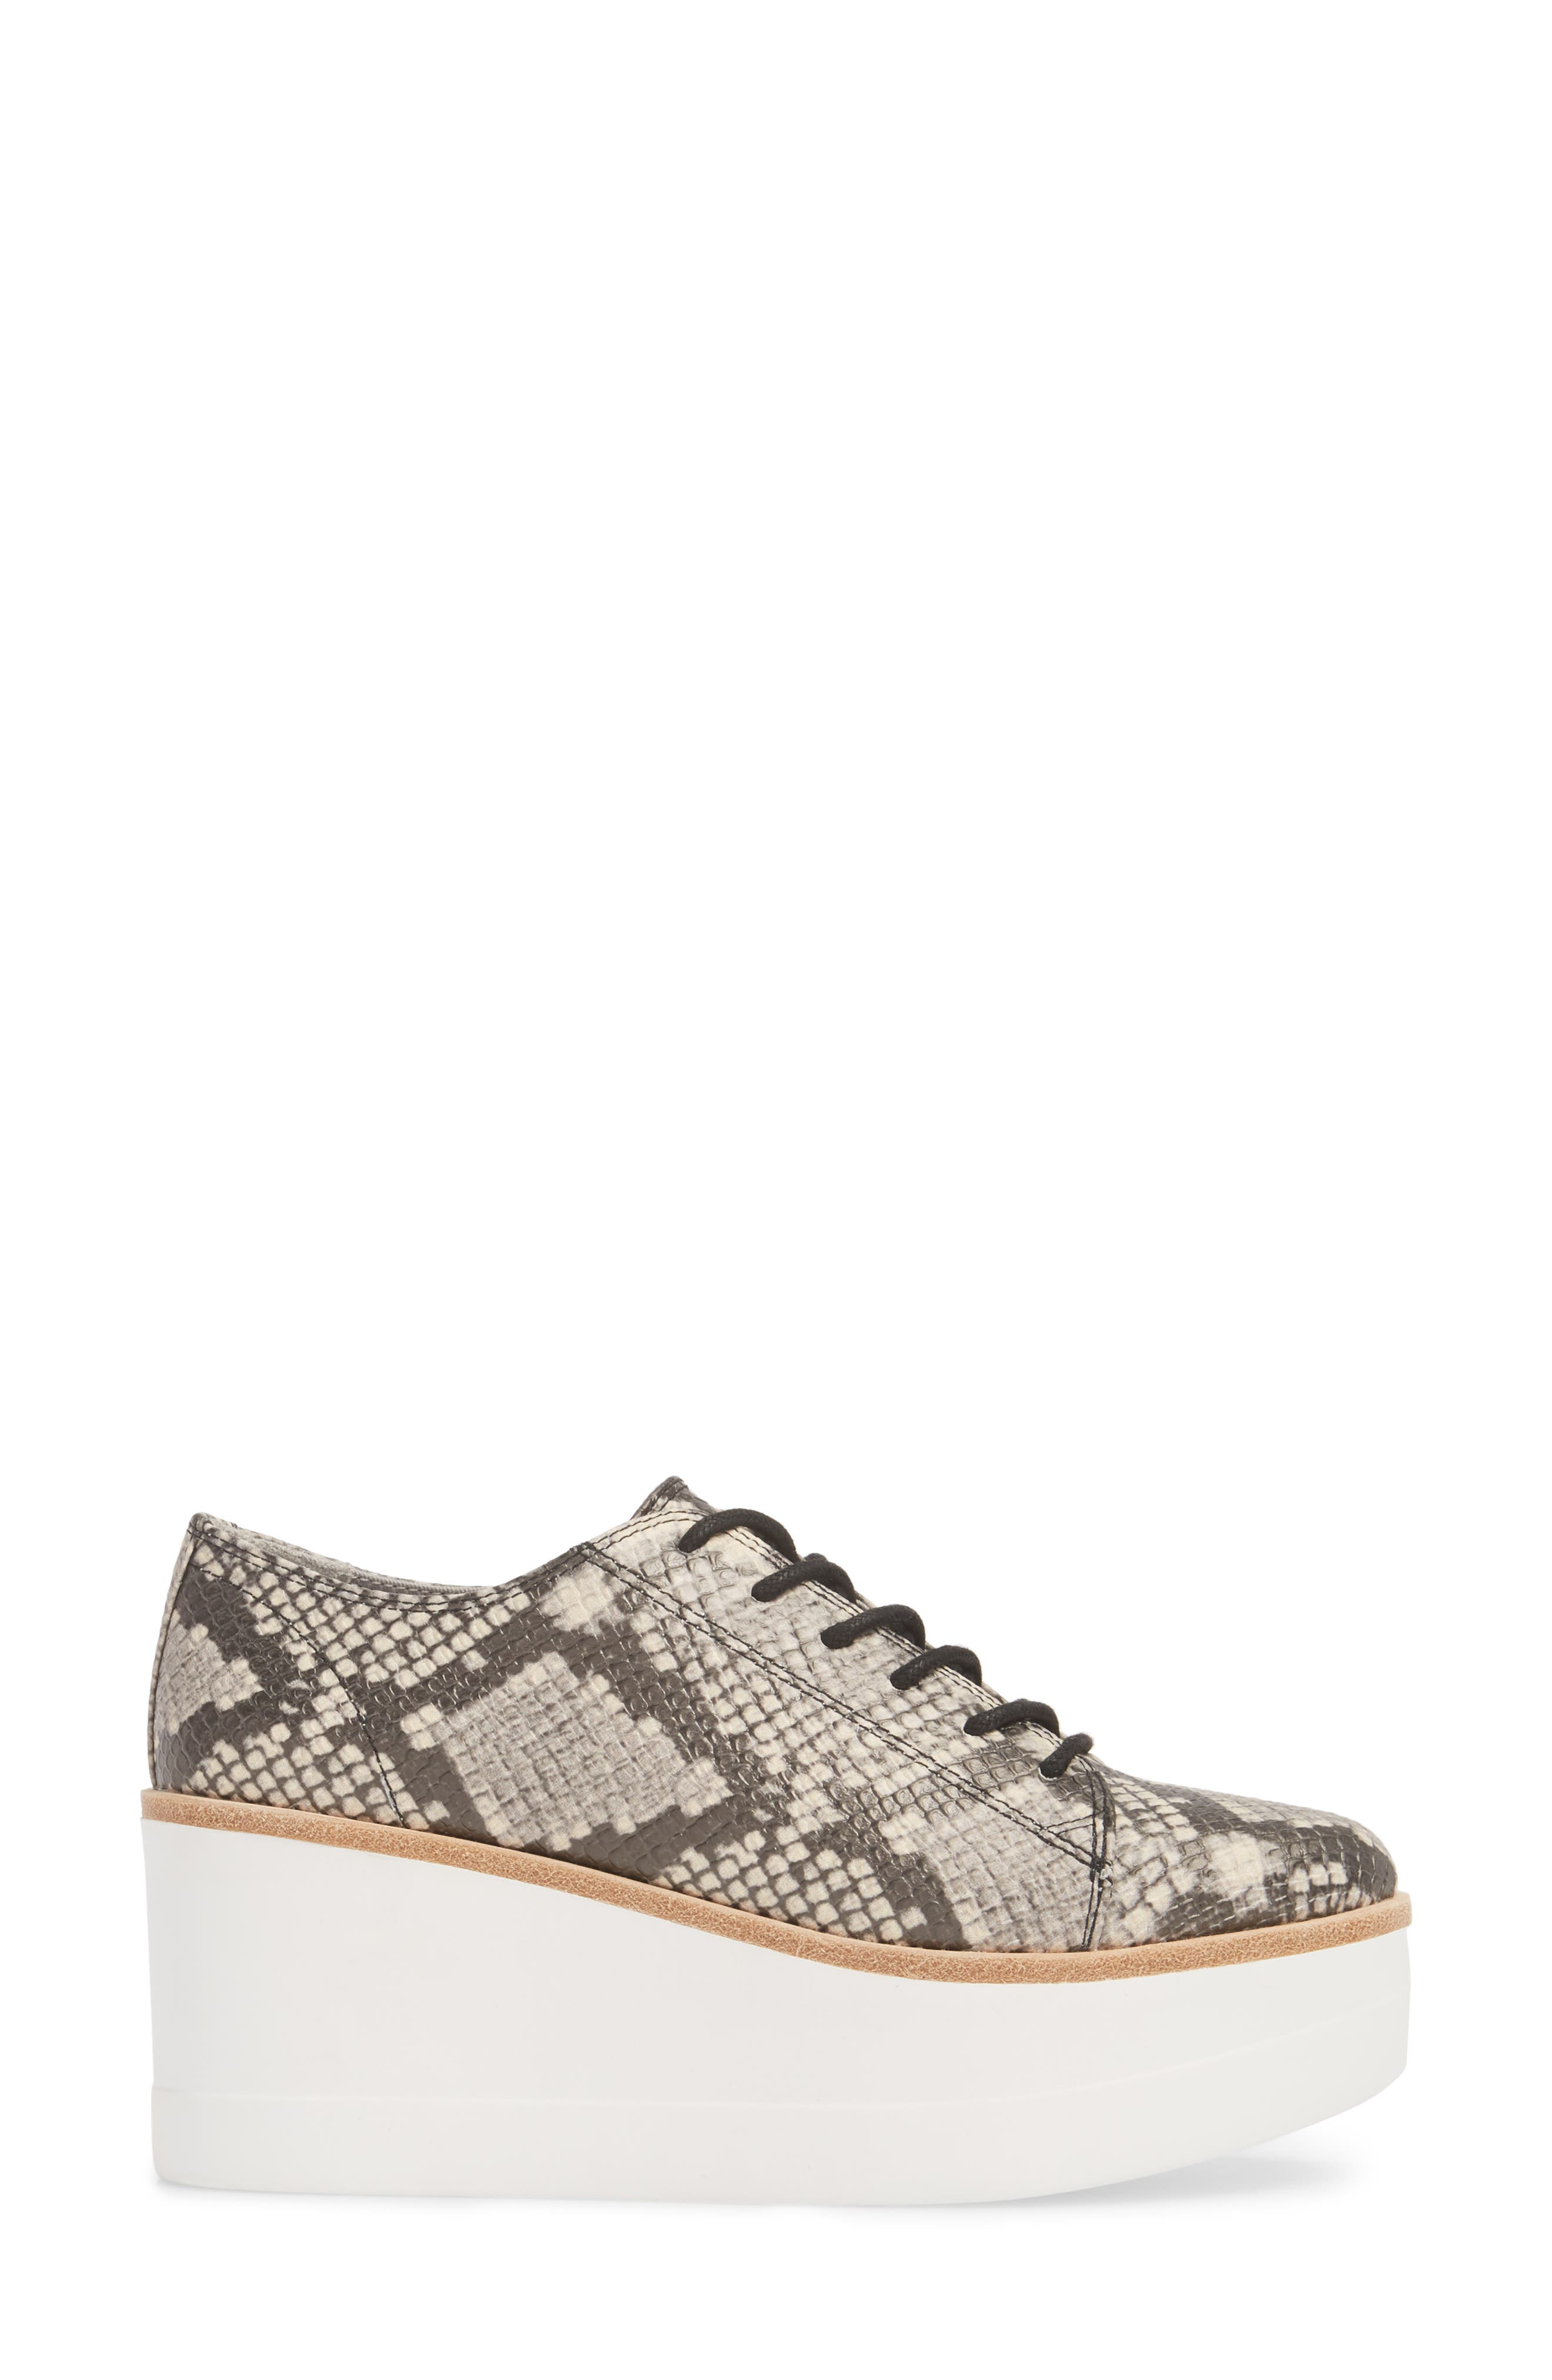 Kimber Wedge Platform Sneaker,                             Alternate thumbnail 3, color,                             Natural Snake Print